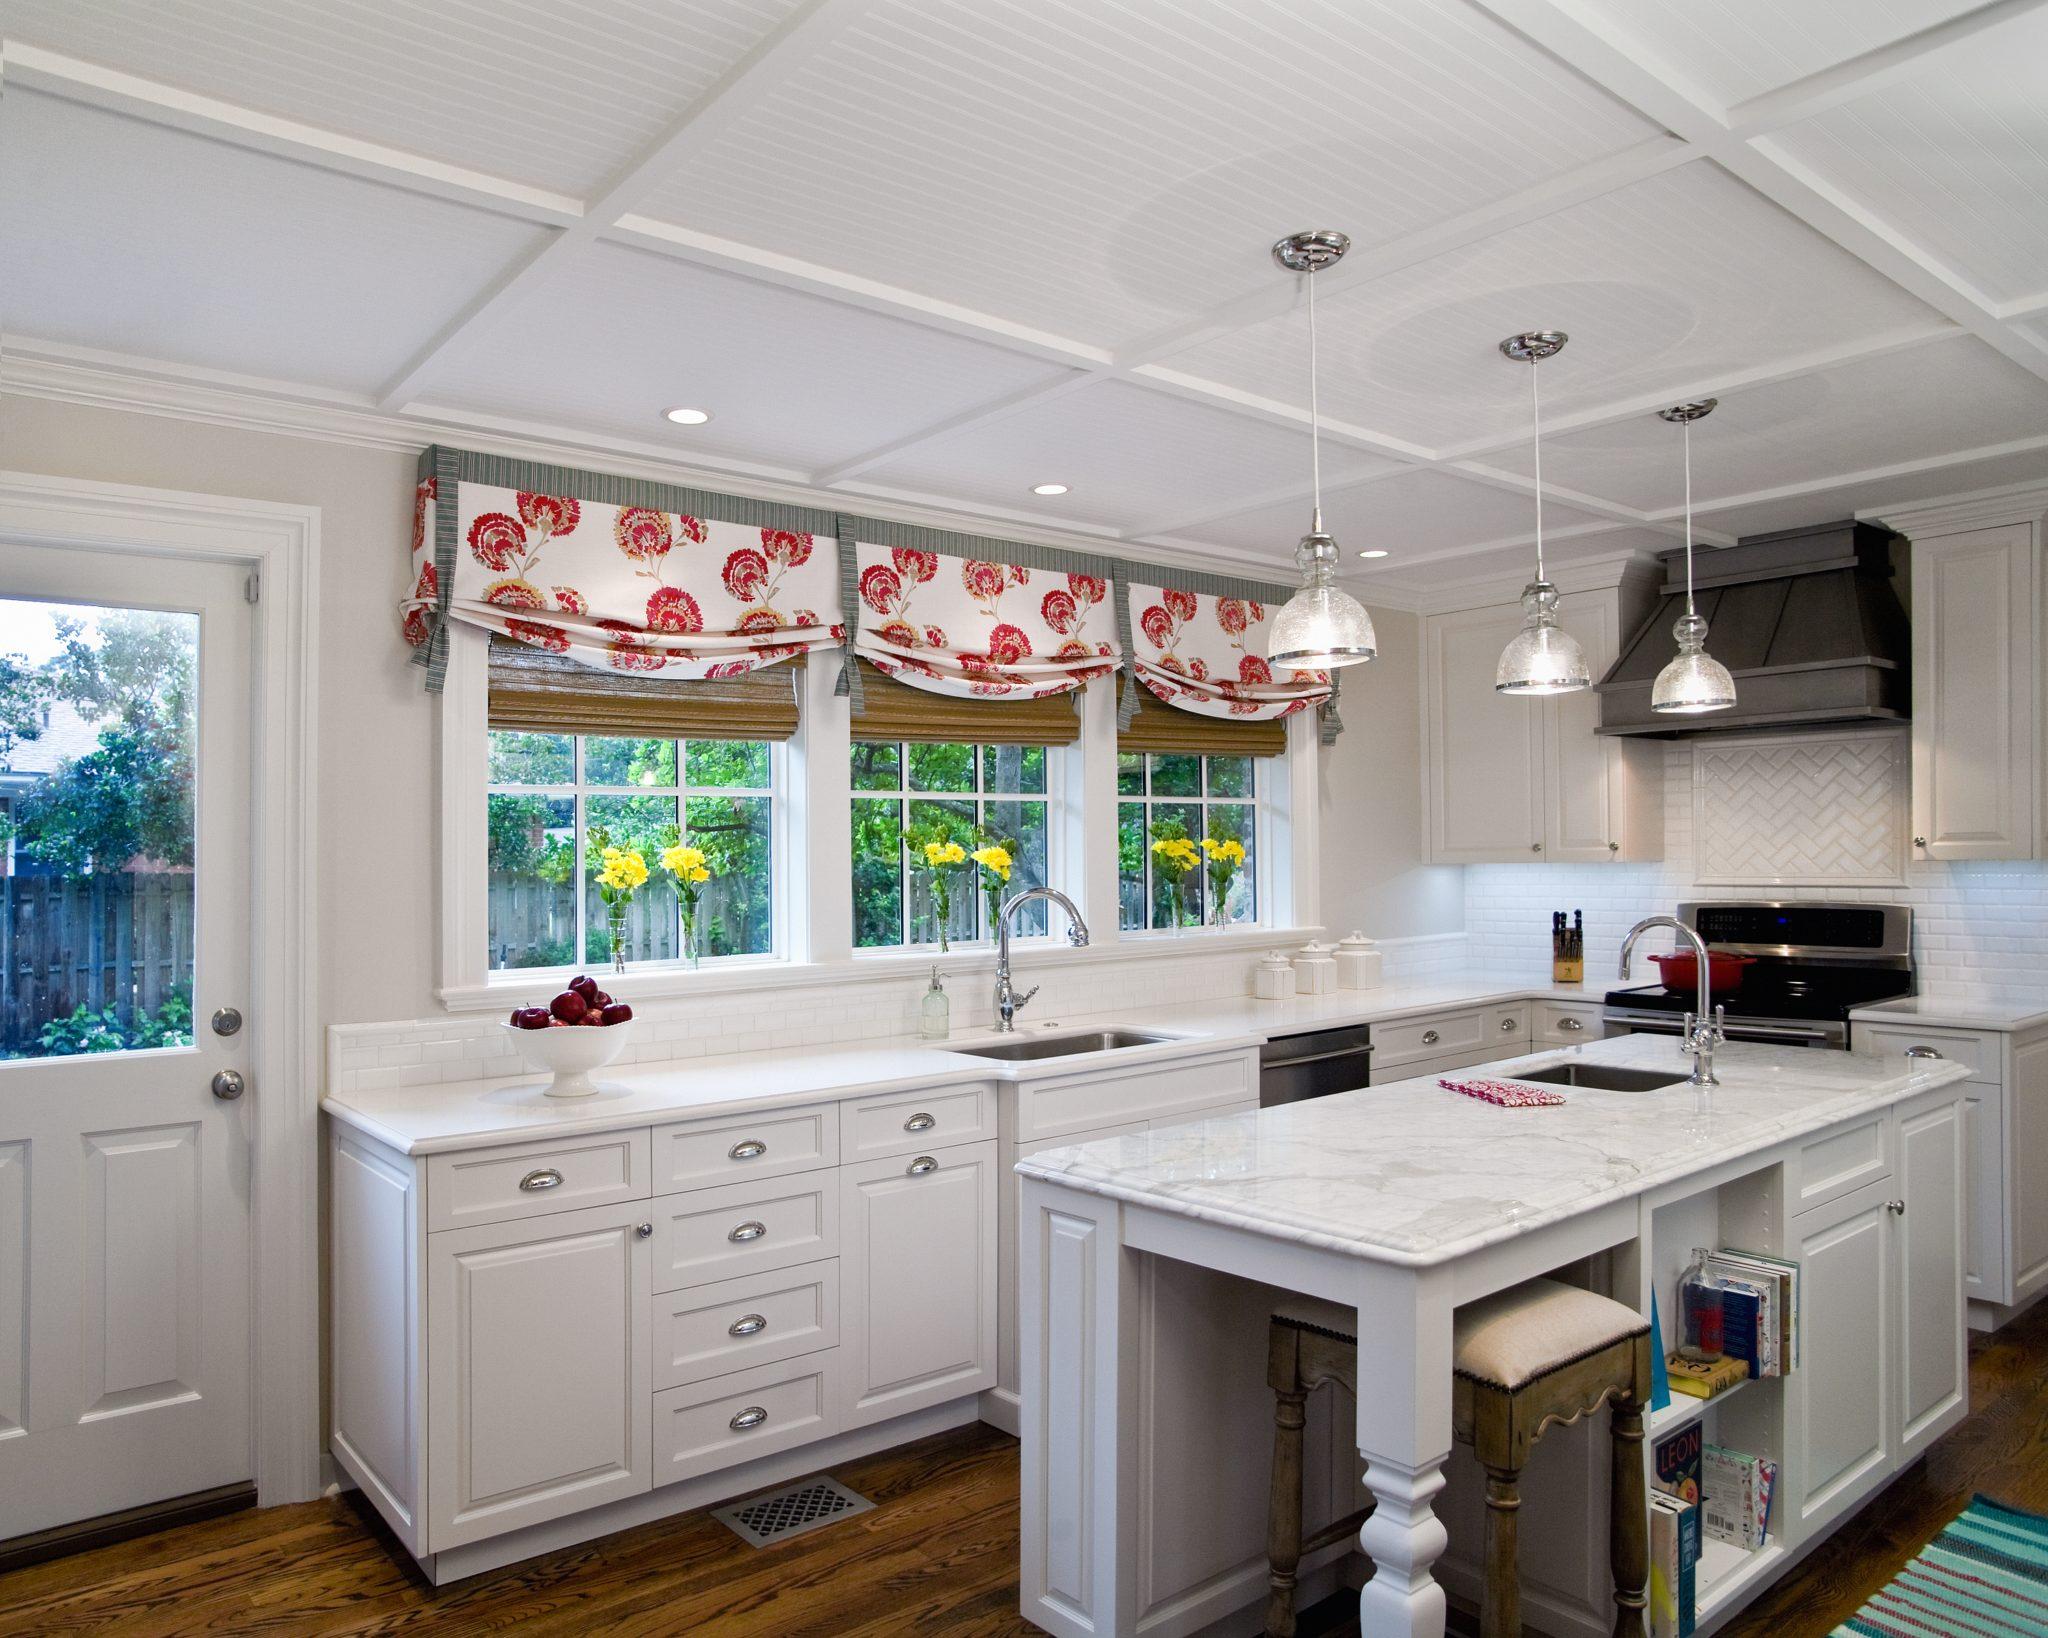 An all-white cottage kitchenby Studio M Interior Design